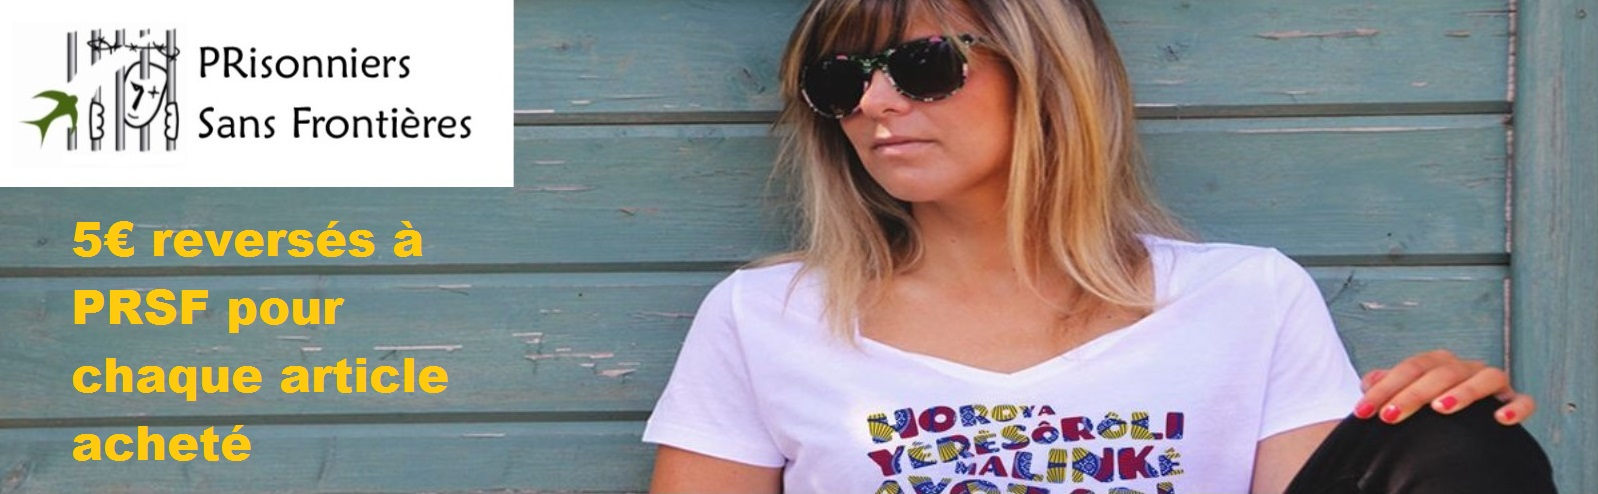 t-shirt collection liberté PRSF